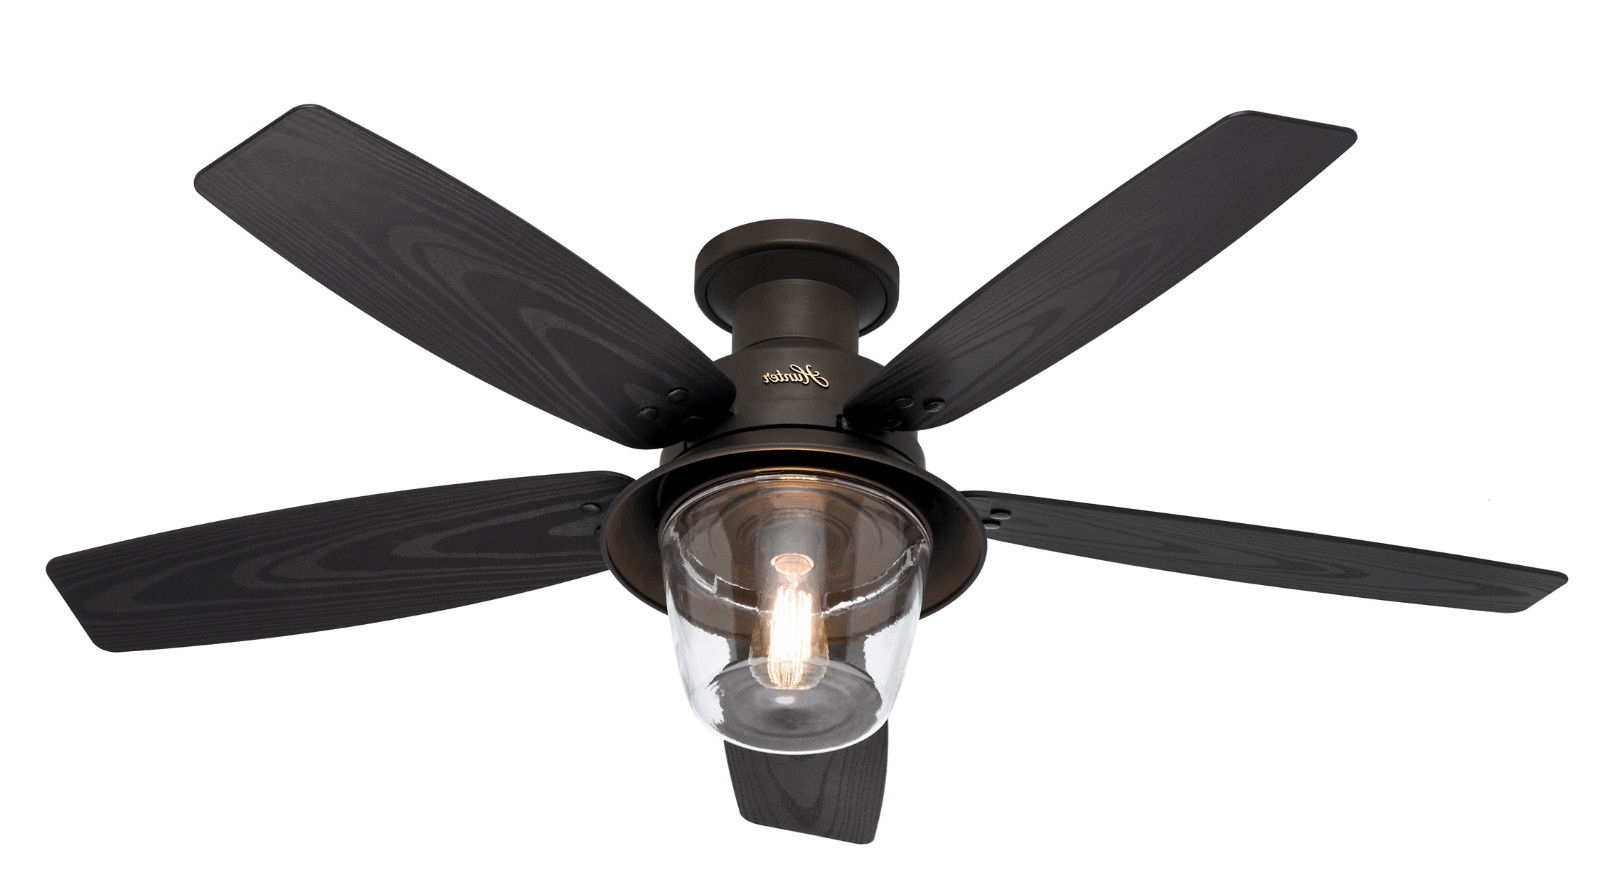 Most Up To Date Industrial Outdoor Ceiling Fans In Ceiling Fan: Breathtaking Black Industrial Ceiling Fan Ideas (View 16 of 20)